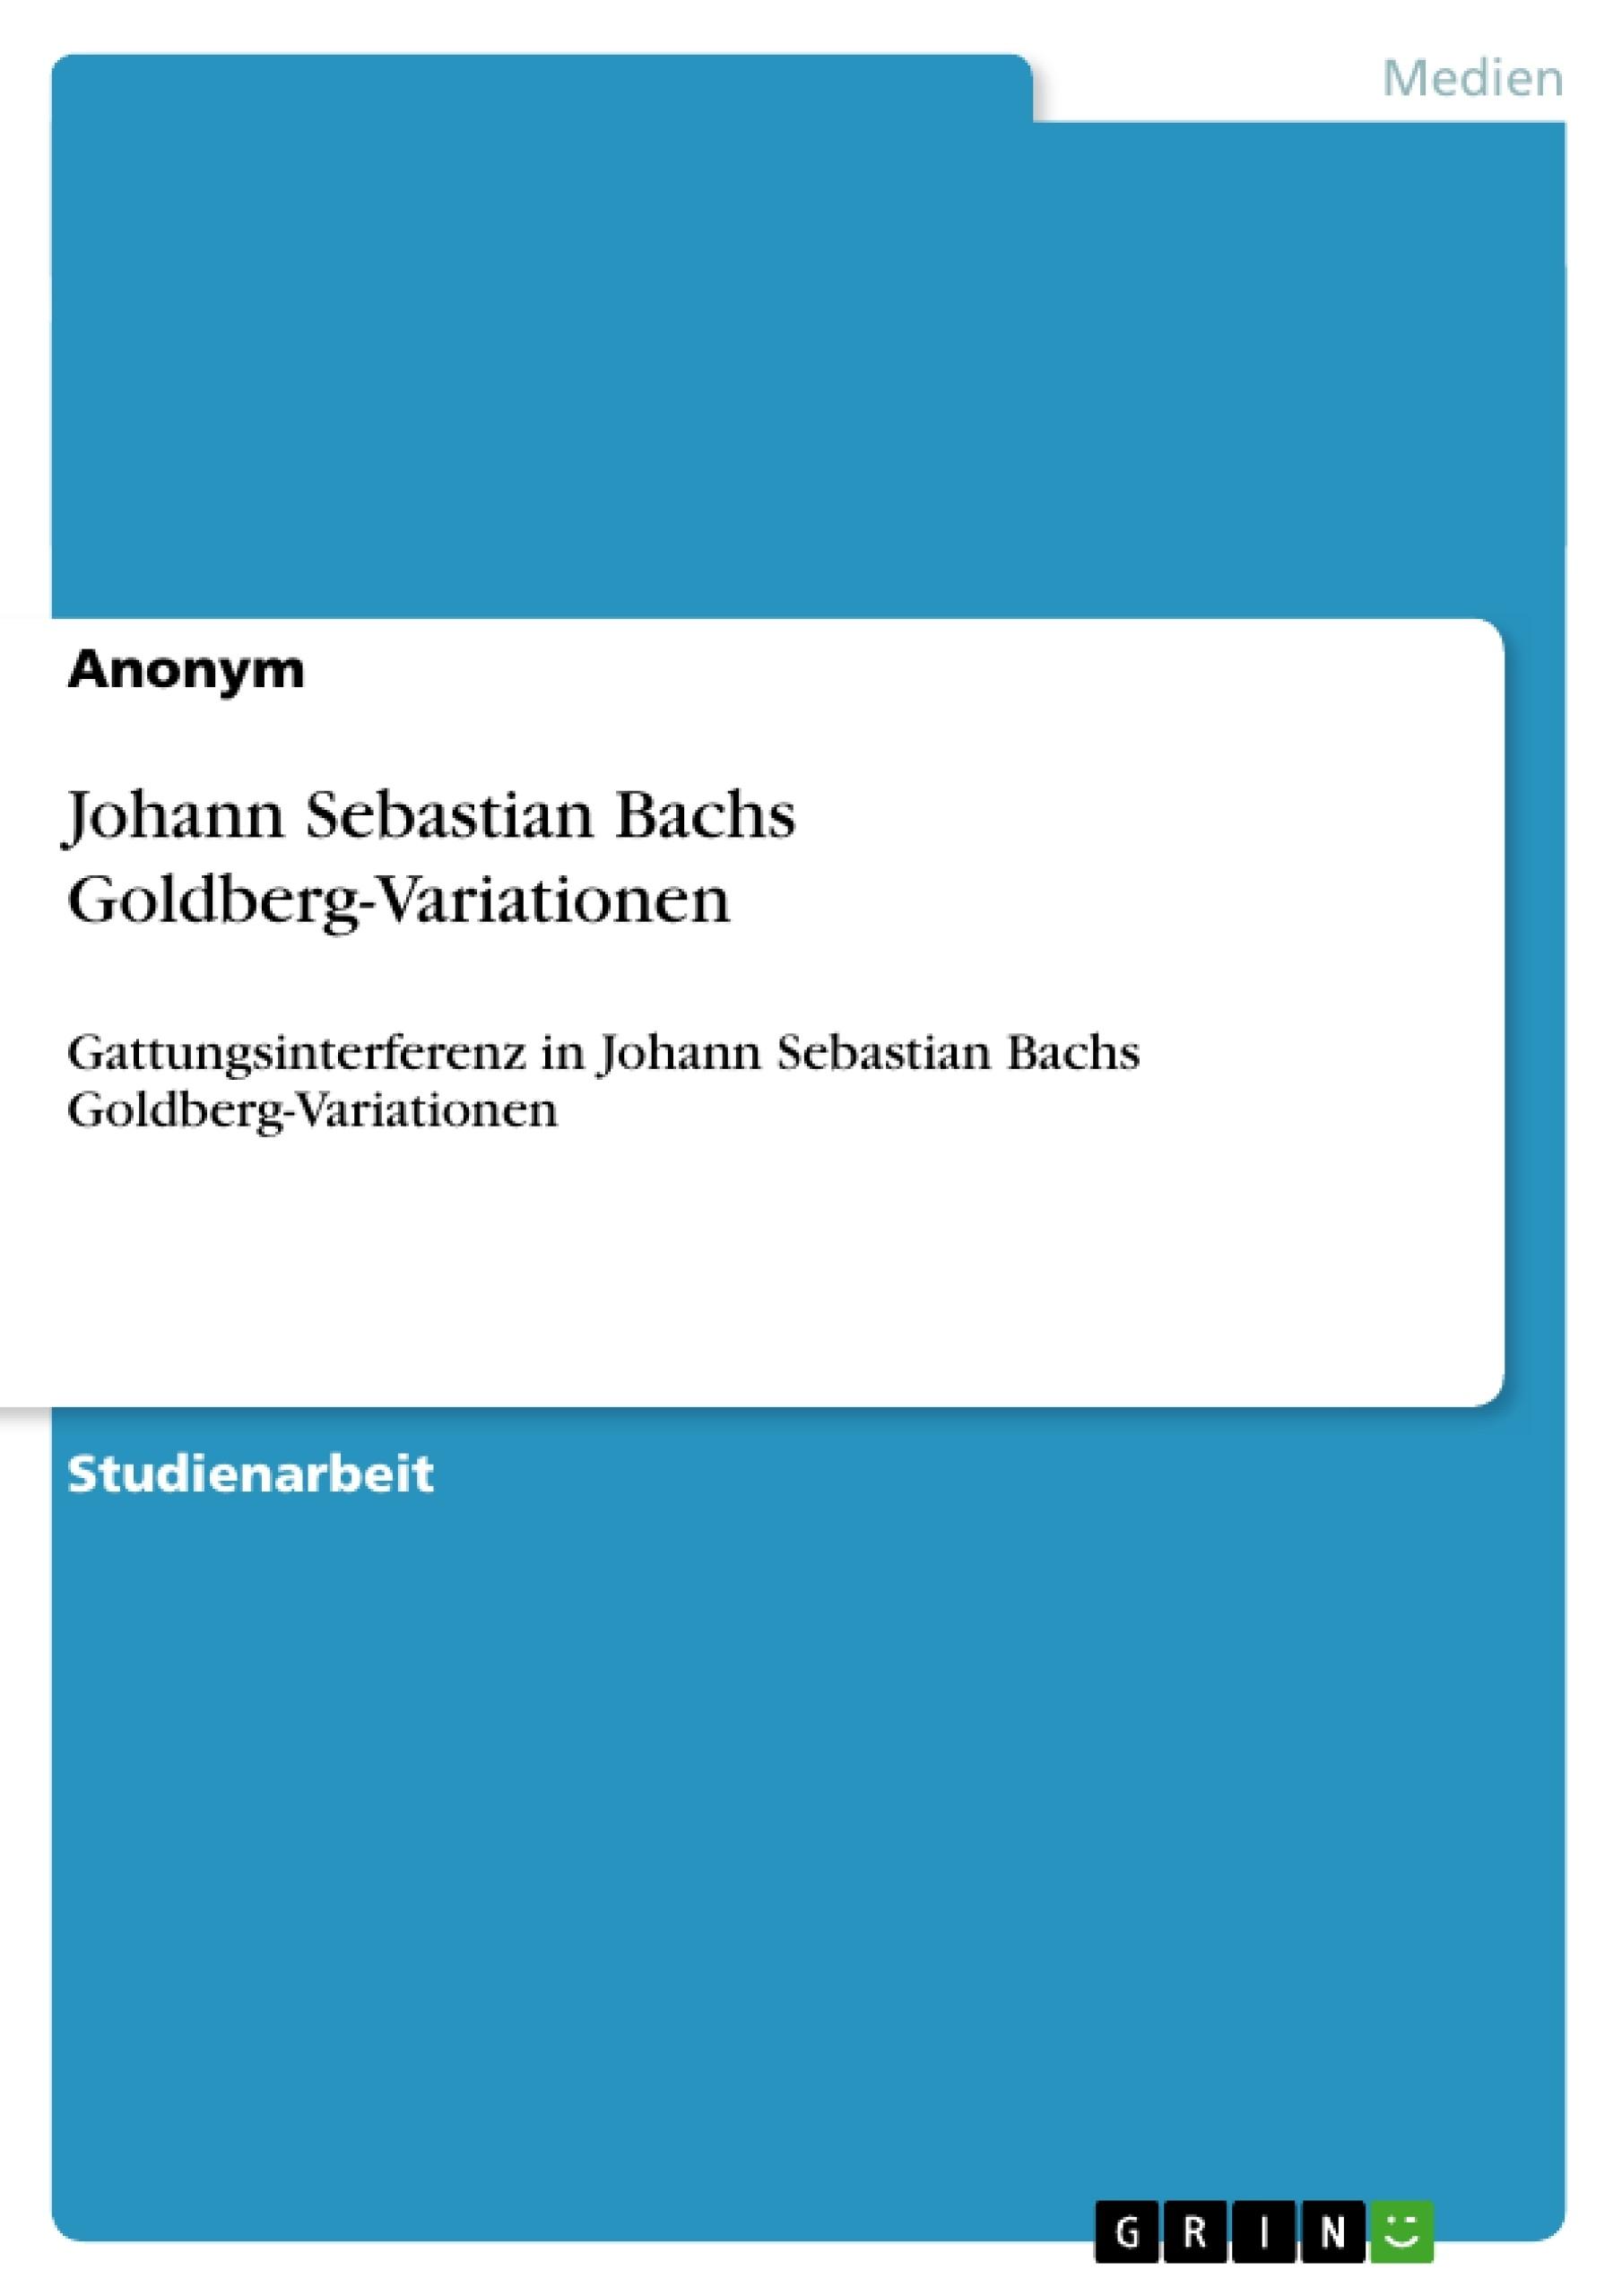 Titel: Johann Sebastian Bachs Goldberg-Variationen